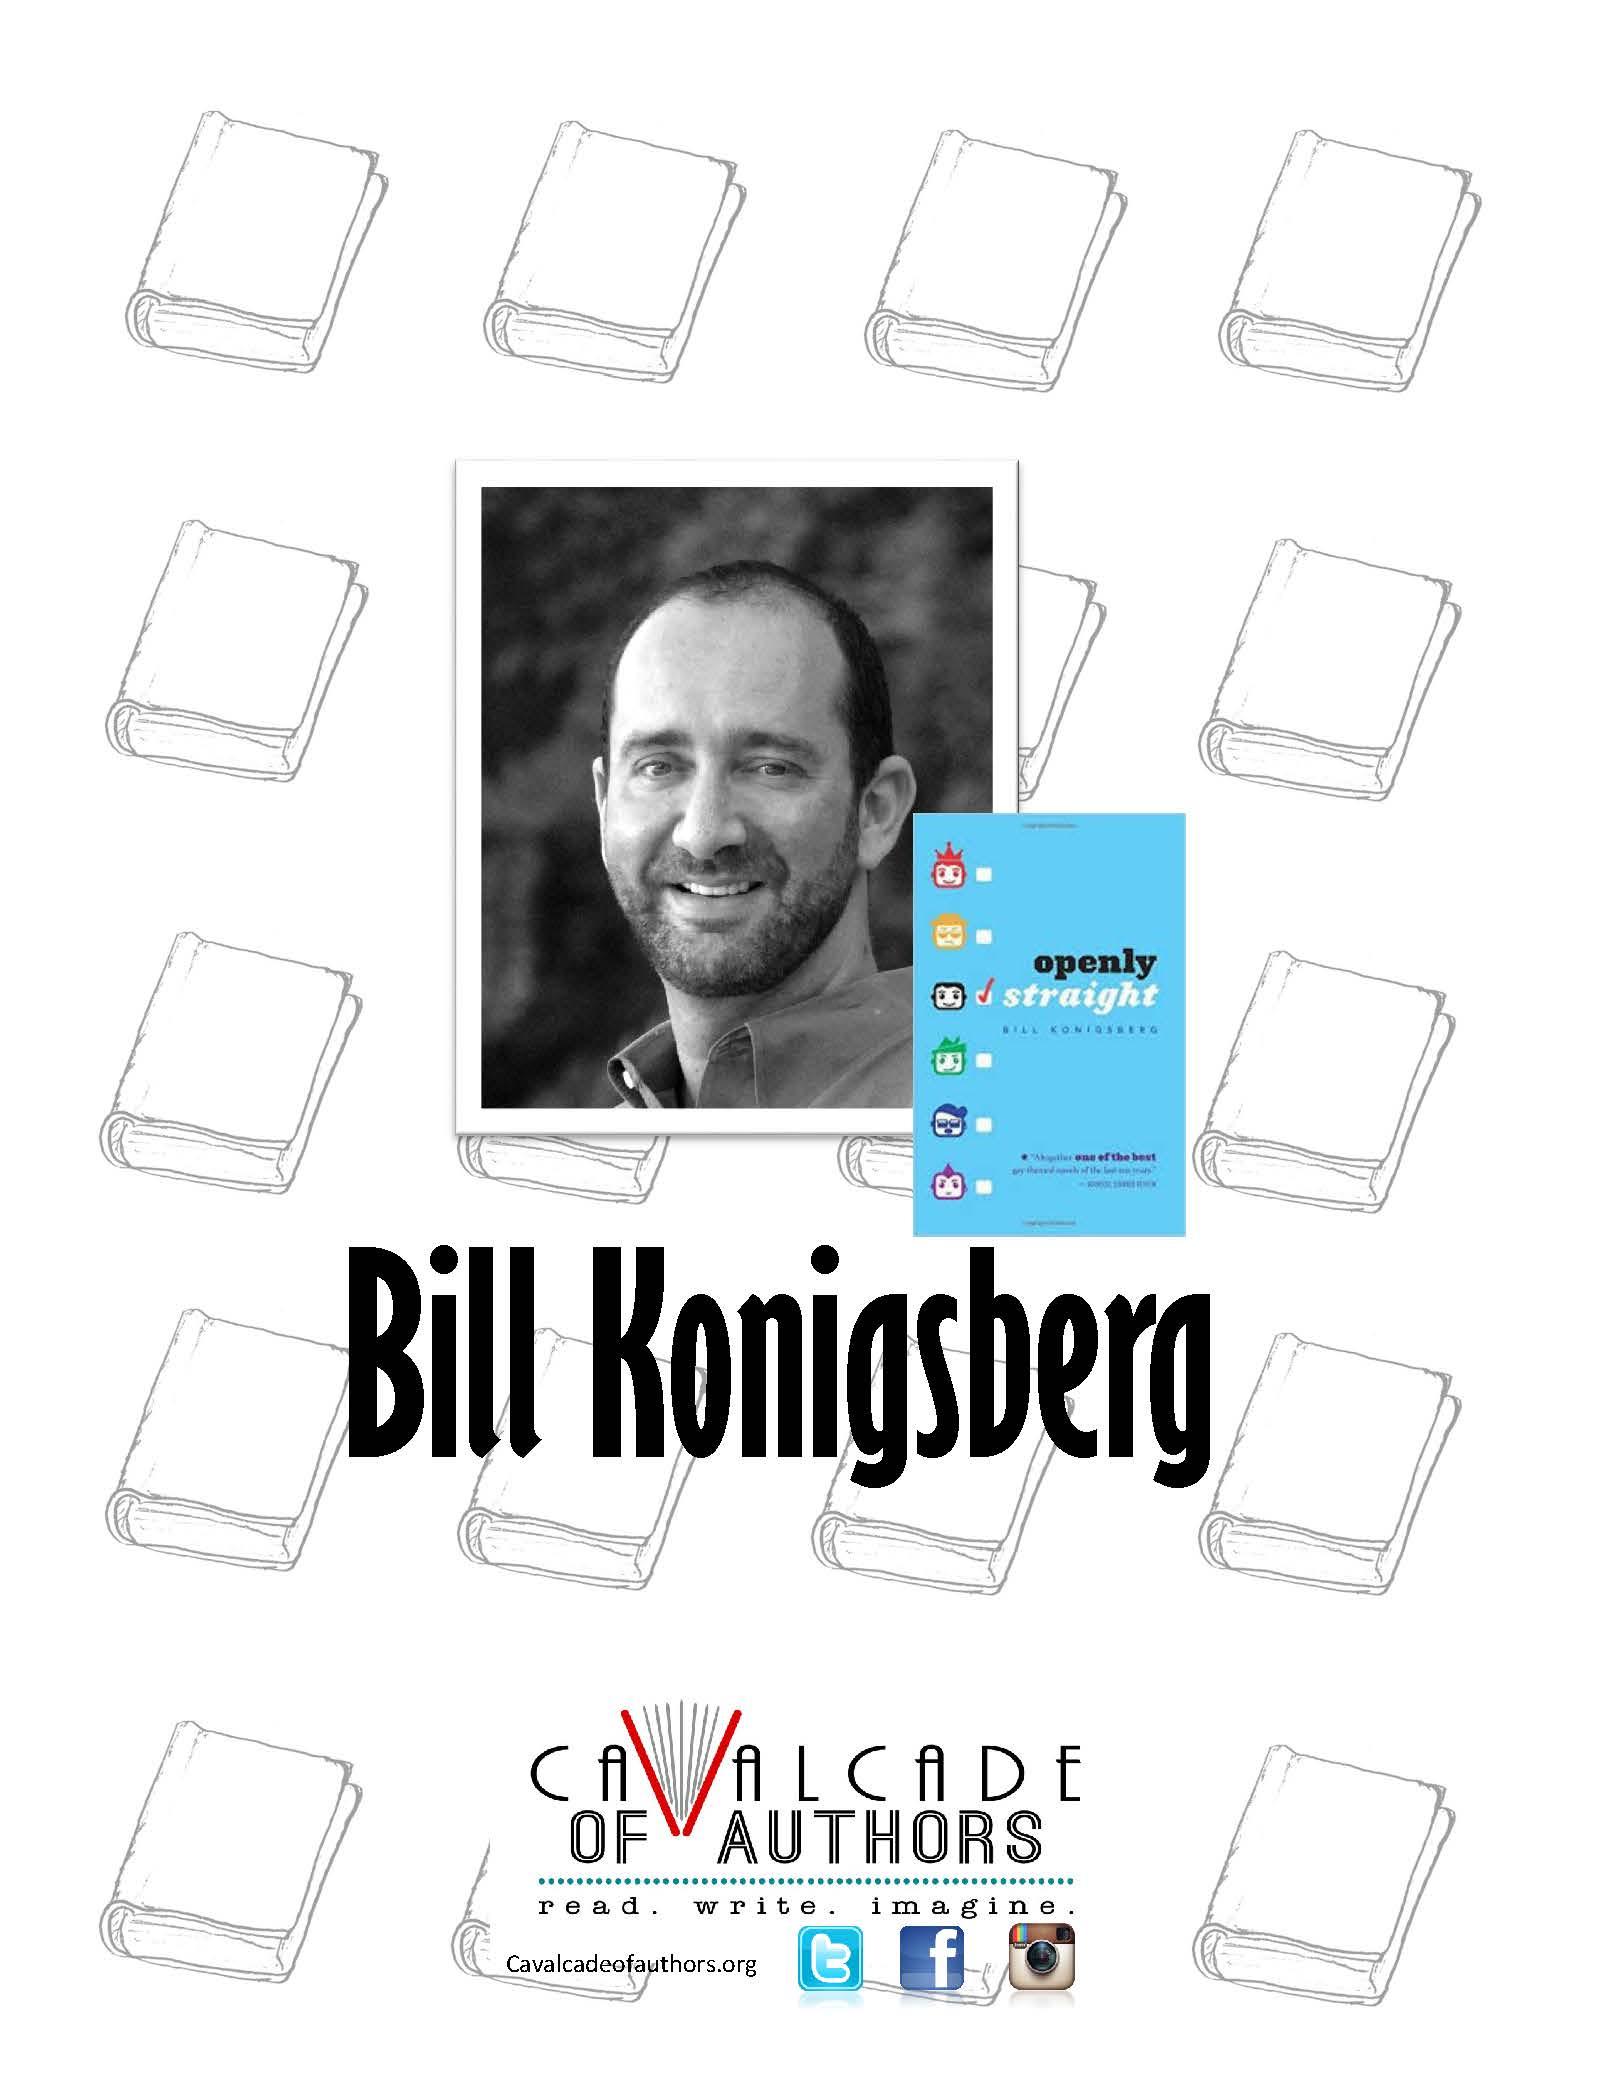 Bill Konigsberg